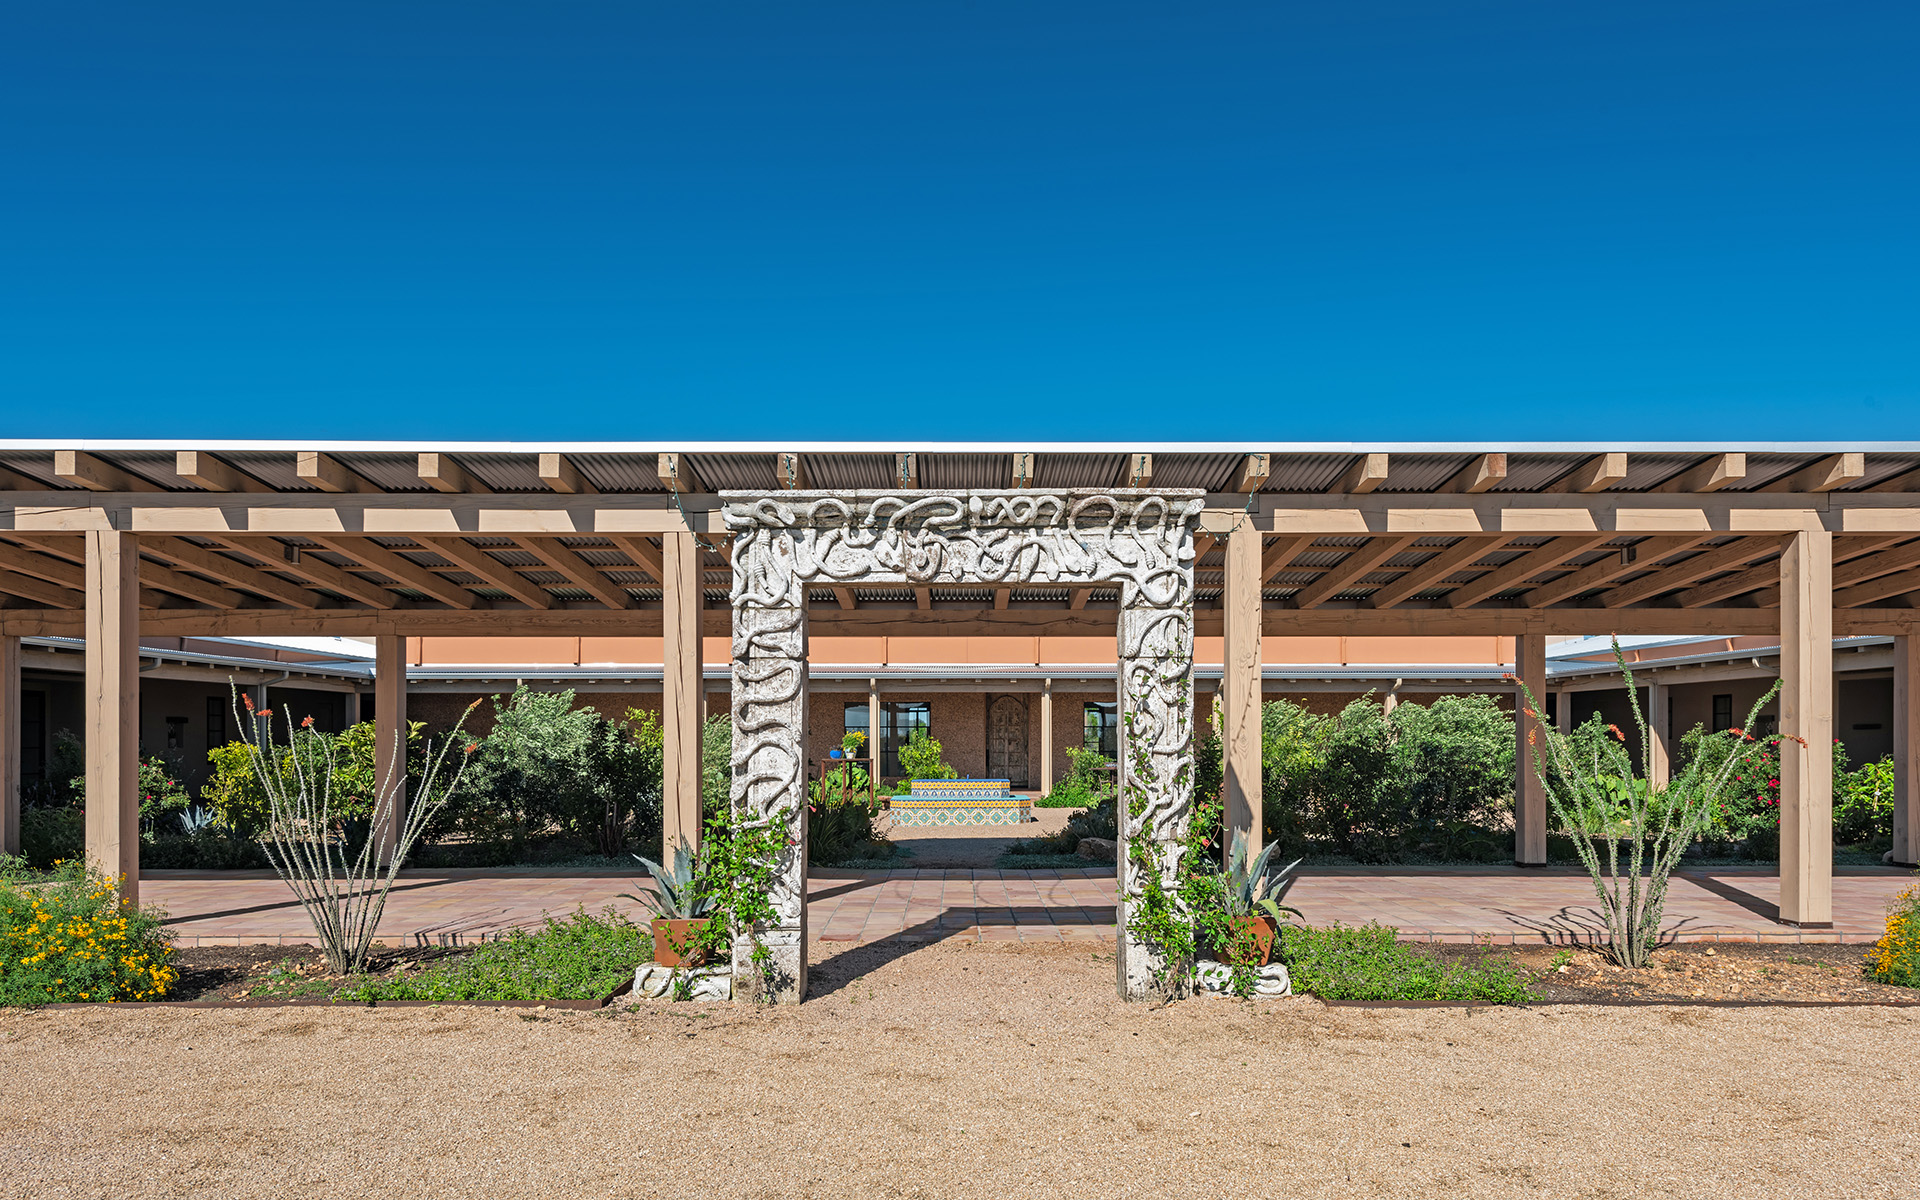 Hacienda Jardin Portal